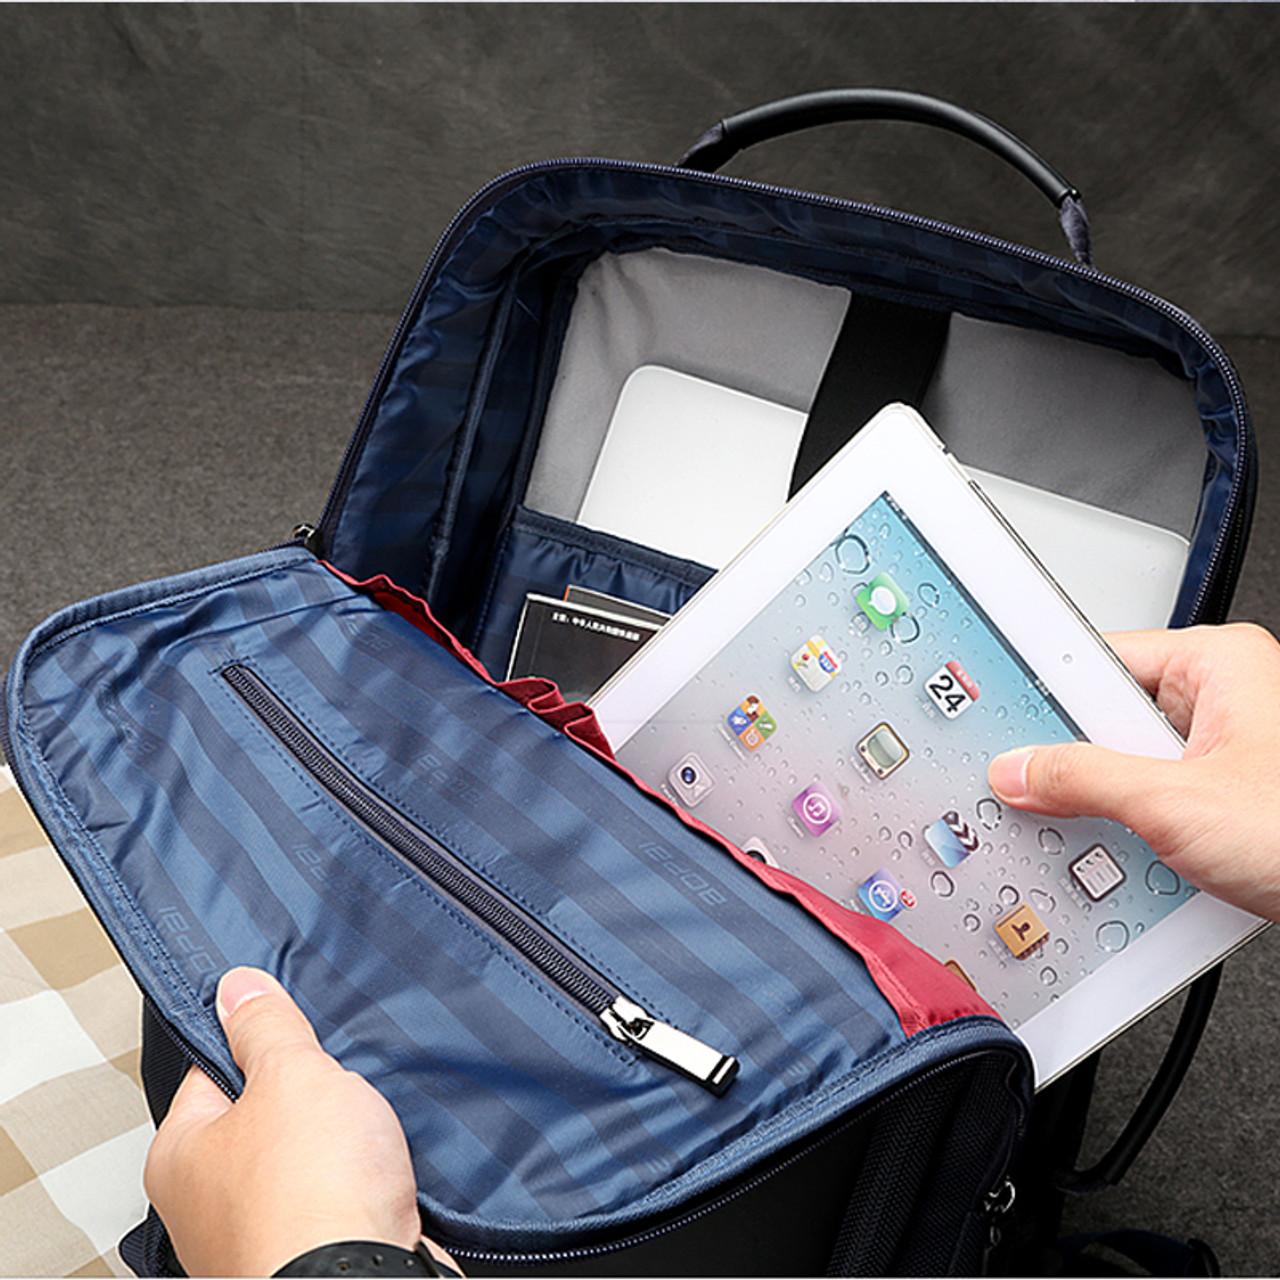 518ad22c21 ... BOPAI Anti theft Enlarge Backpack USB External Charge 15.6 Inch Laptop Backpack  Men Waterproof School Backpack ...